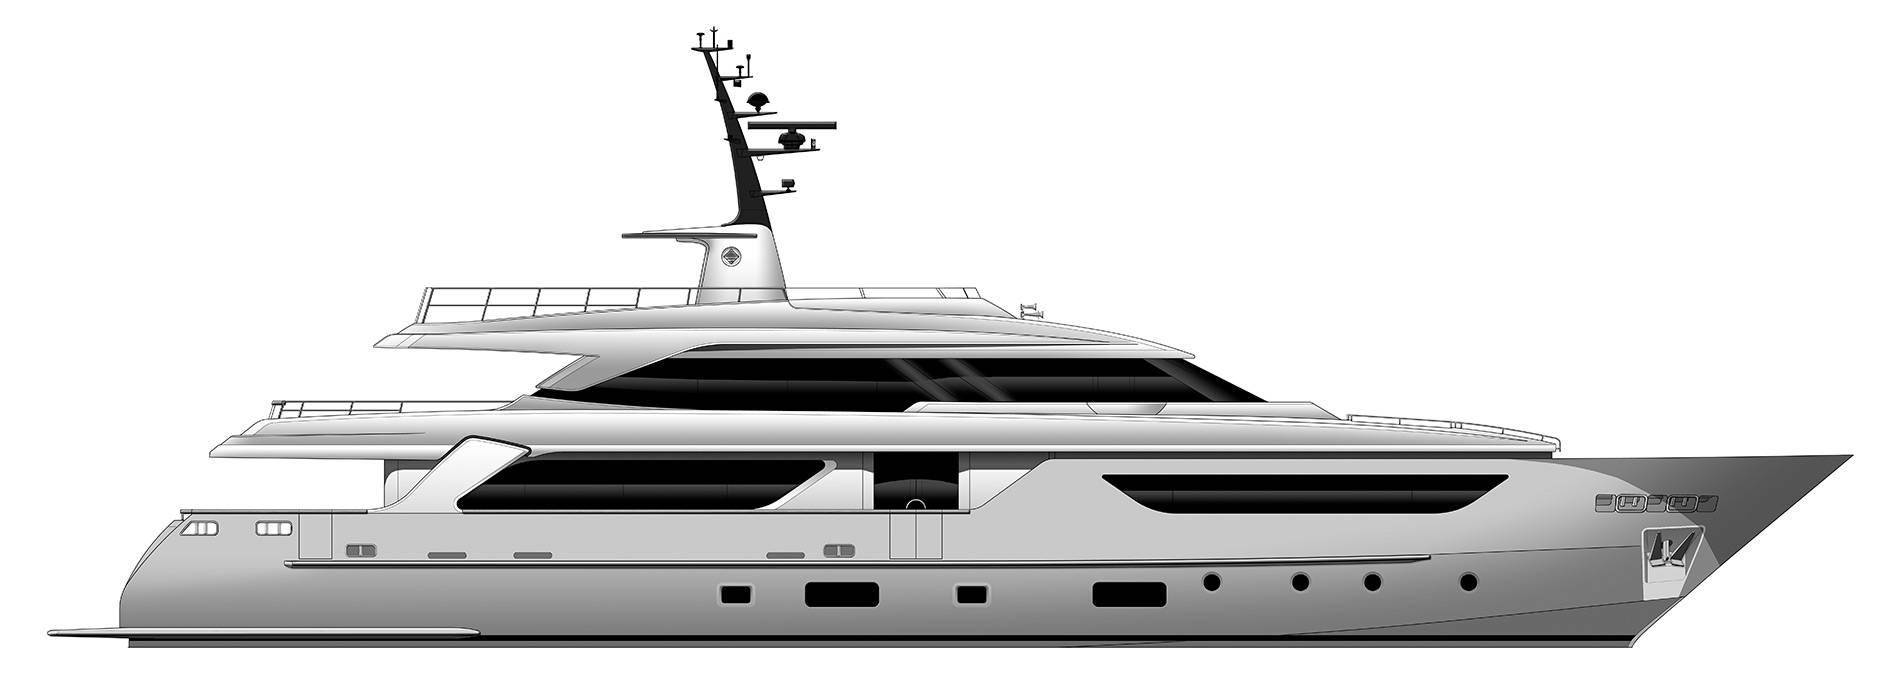 Sanlorenzo Yachts SD126 Profile